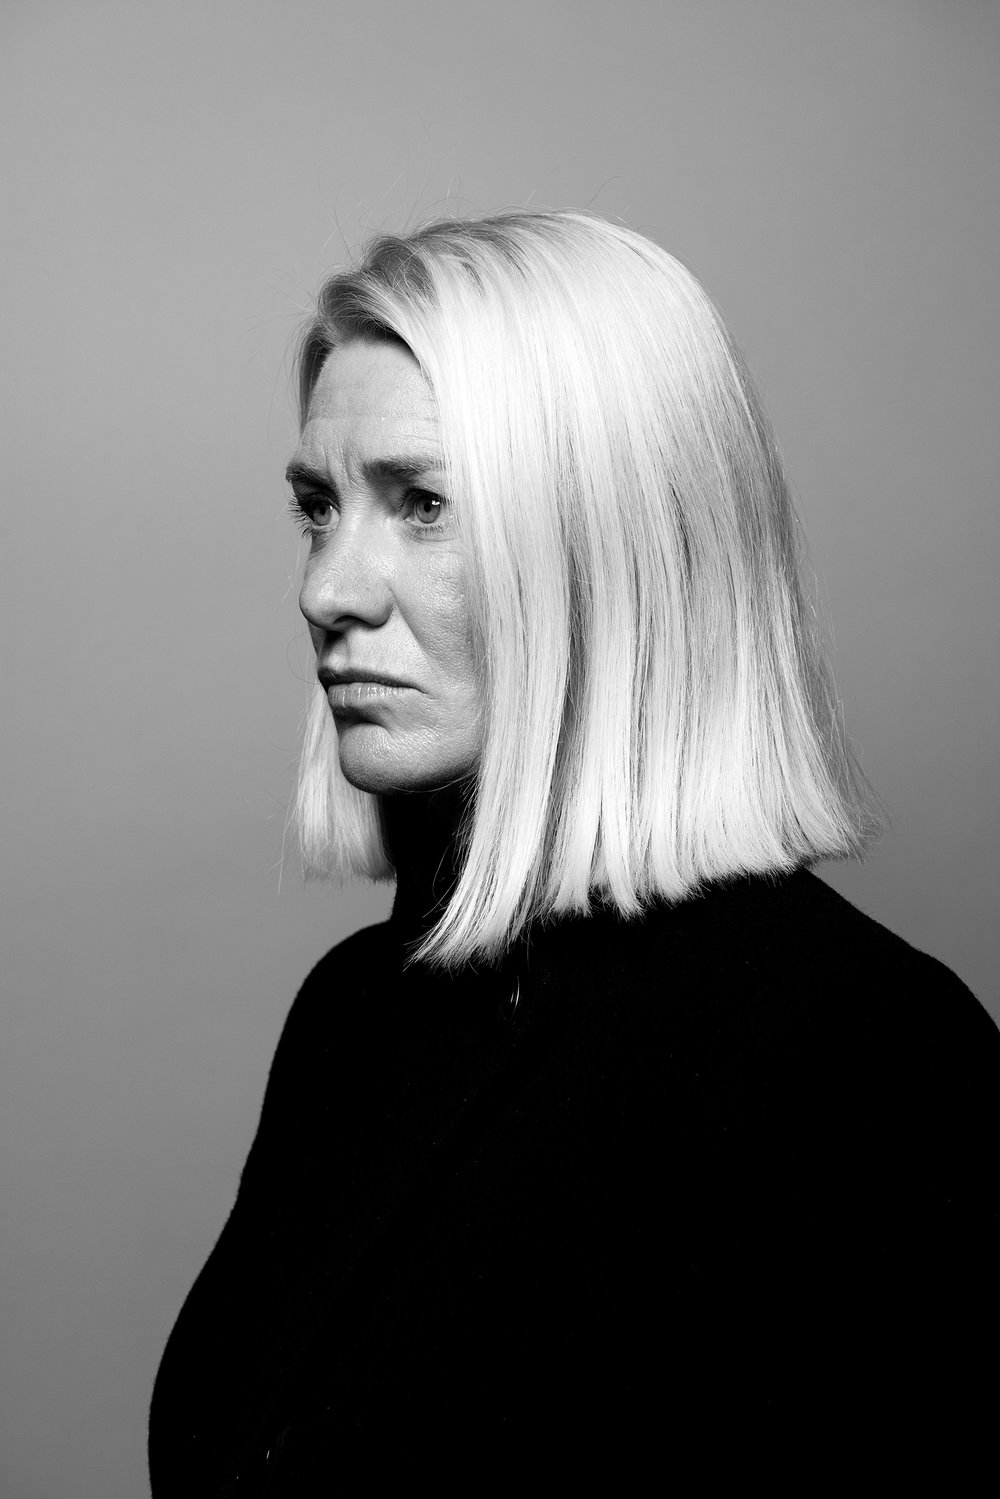 Amanda Milling, MP for Cannock Chase